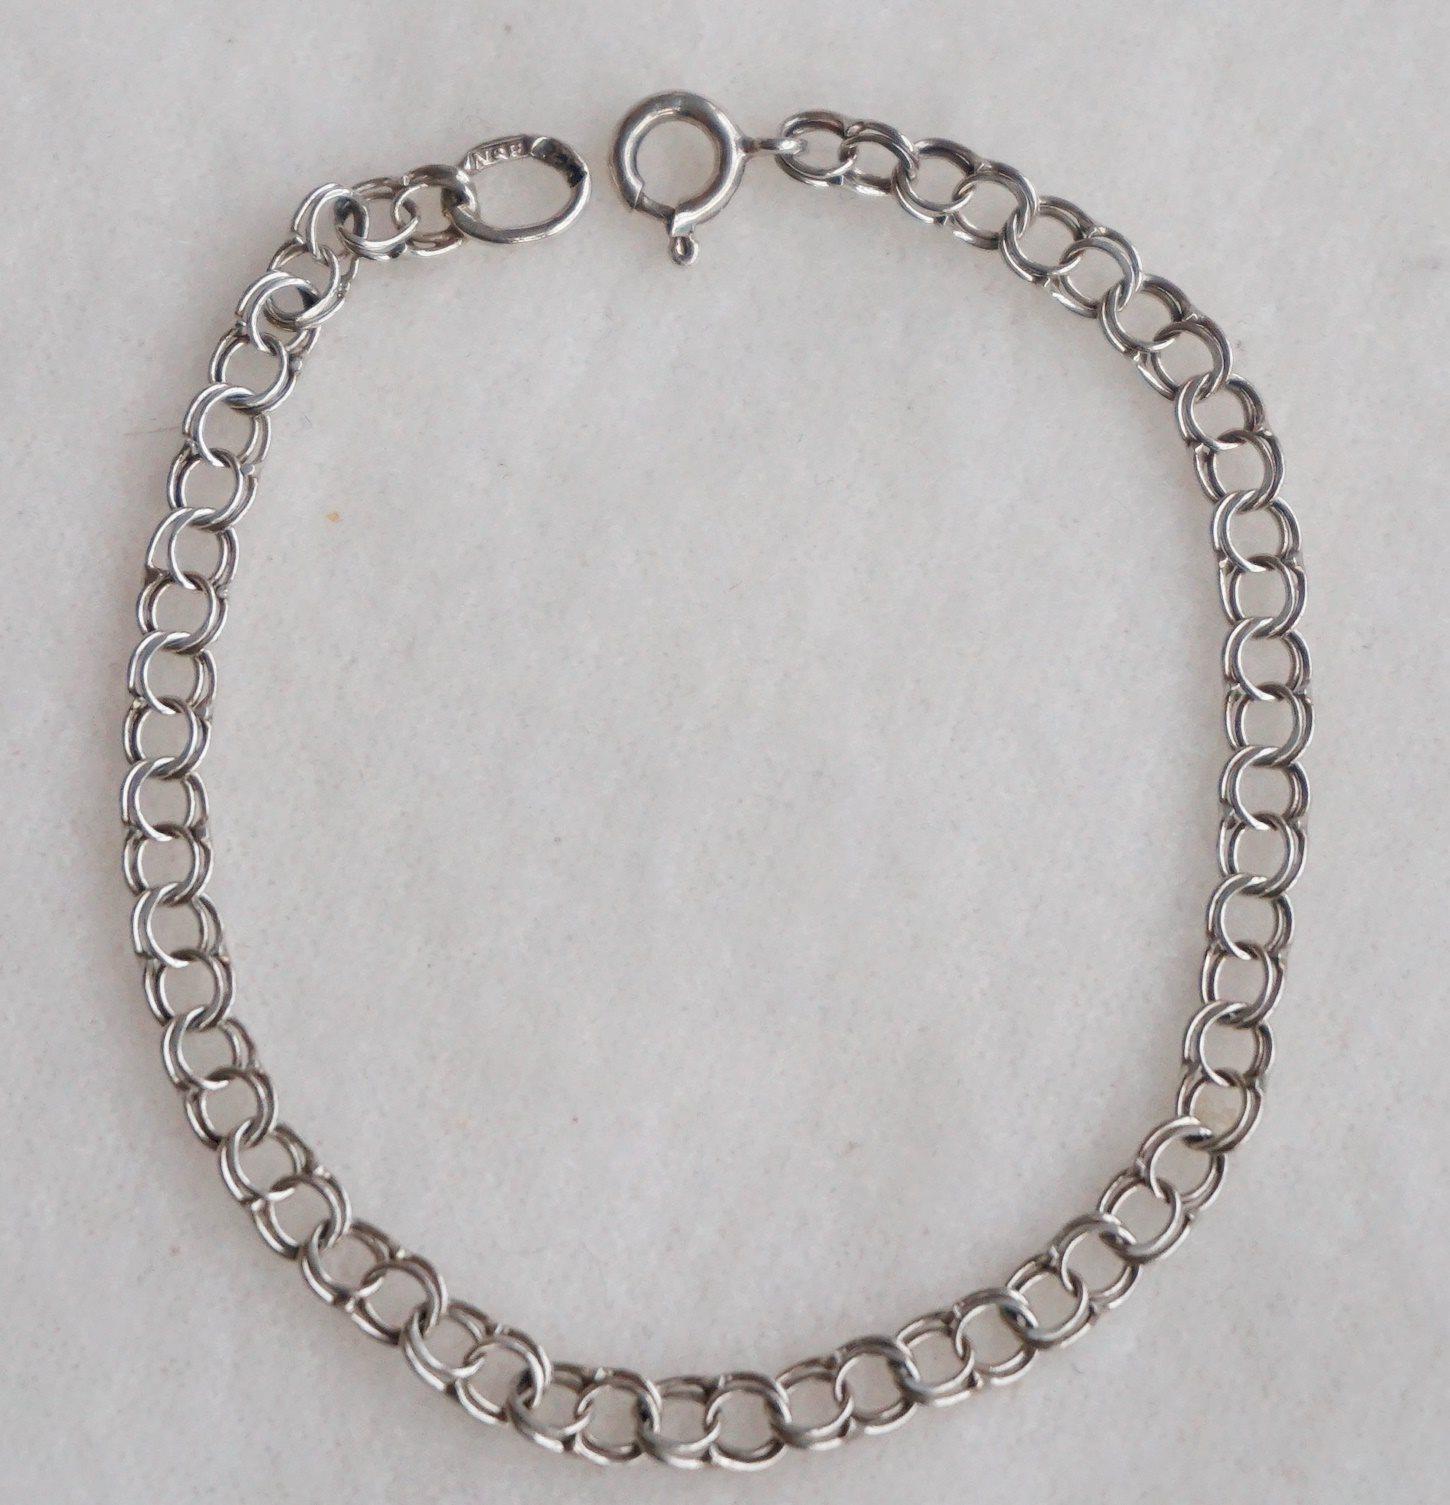 Bismarck  bismark armband Äkta silver (338065581) ᐈ Köp på Tradera a93b2b19ad15d